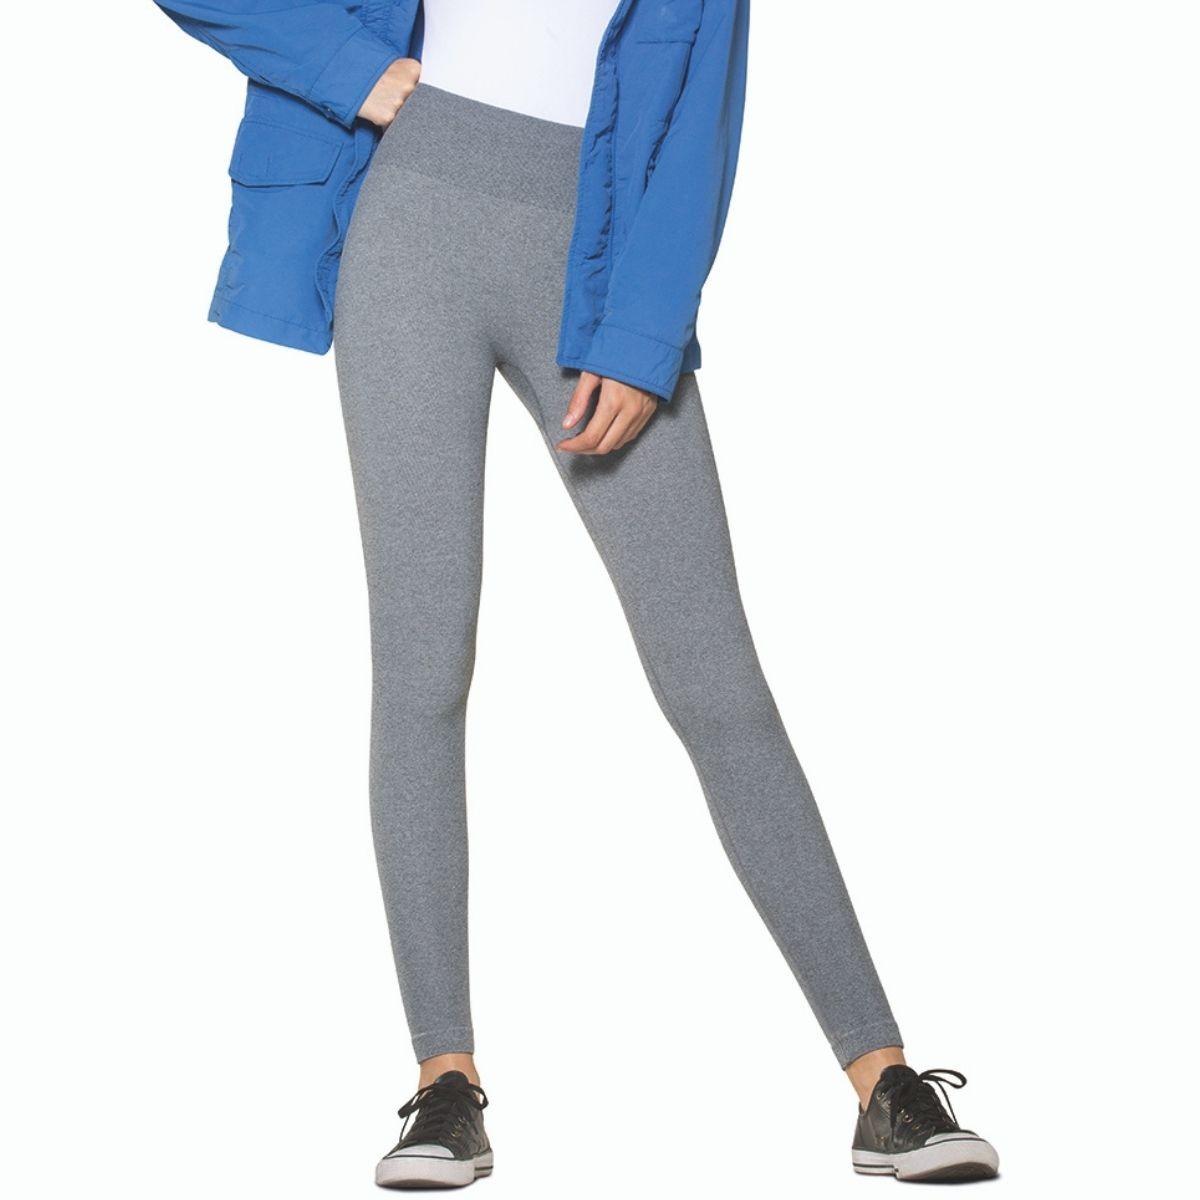 Calça legging sem costura silicone interno fio 150 lupo